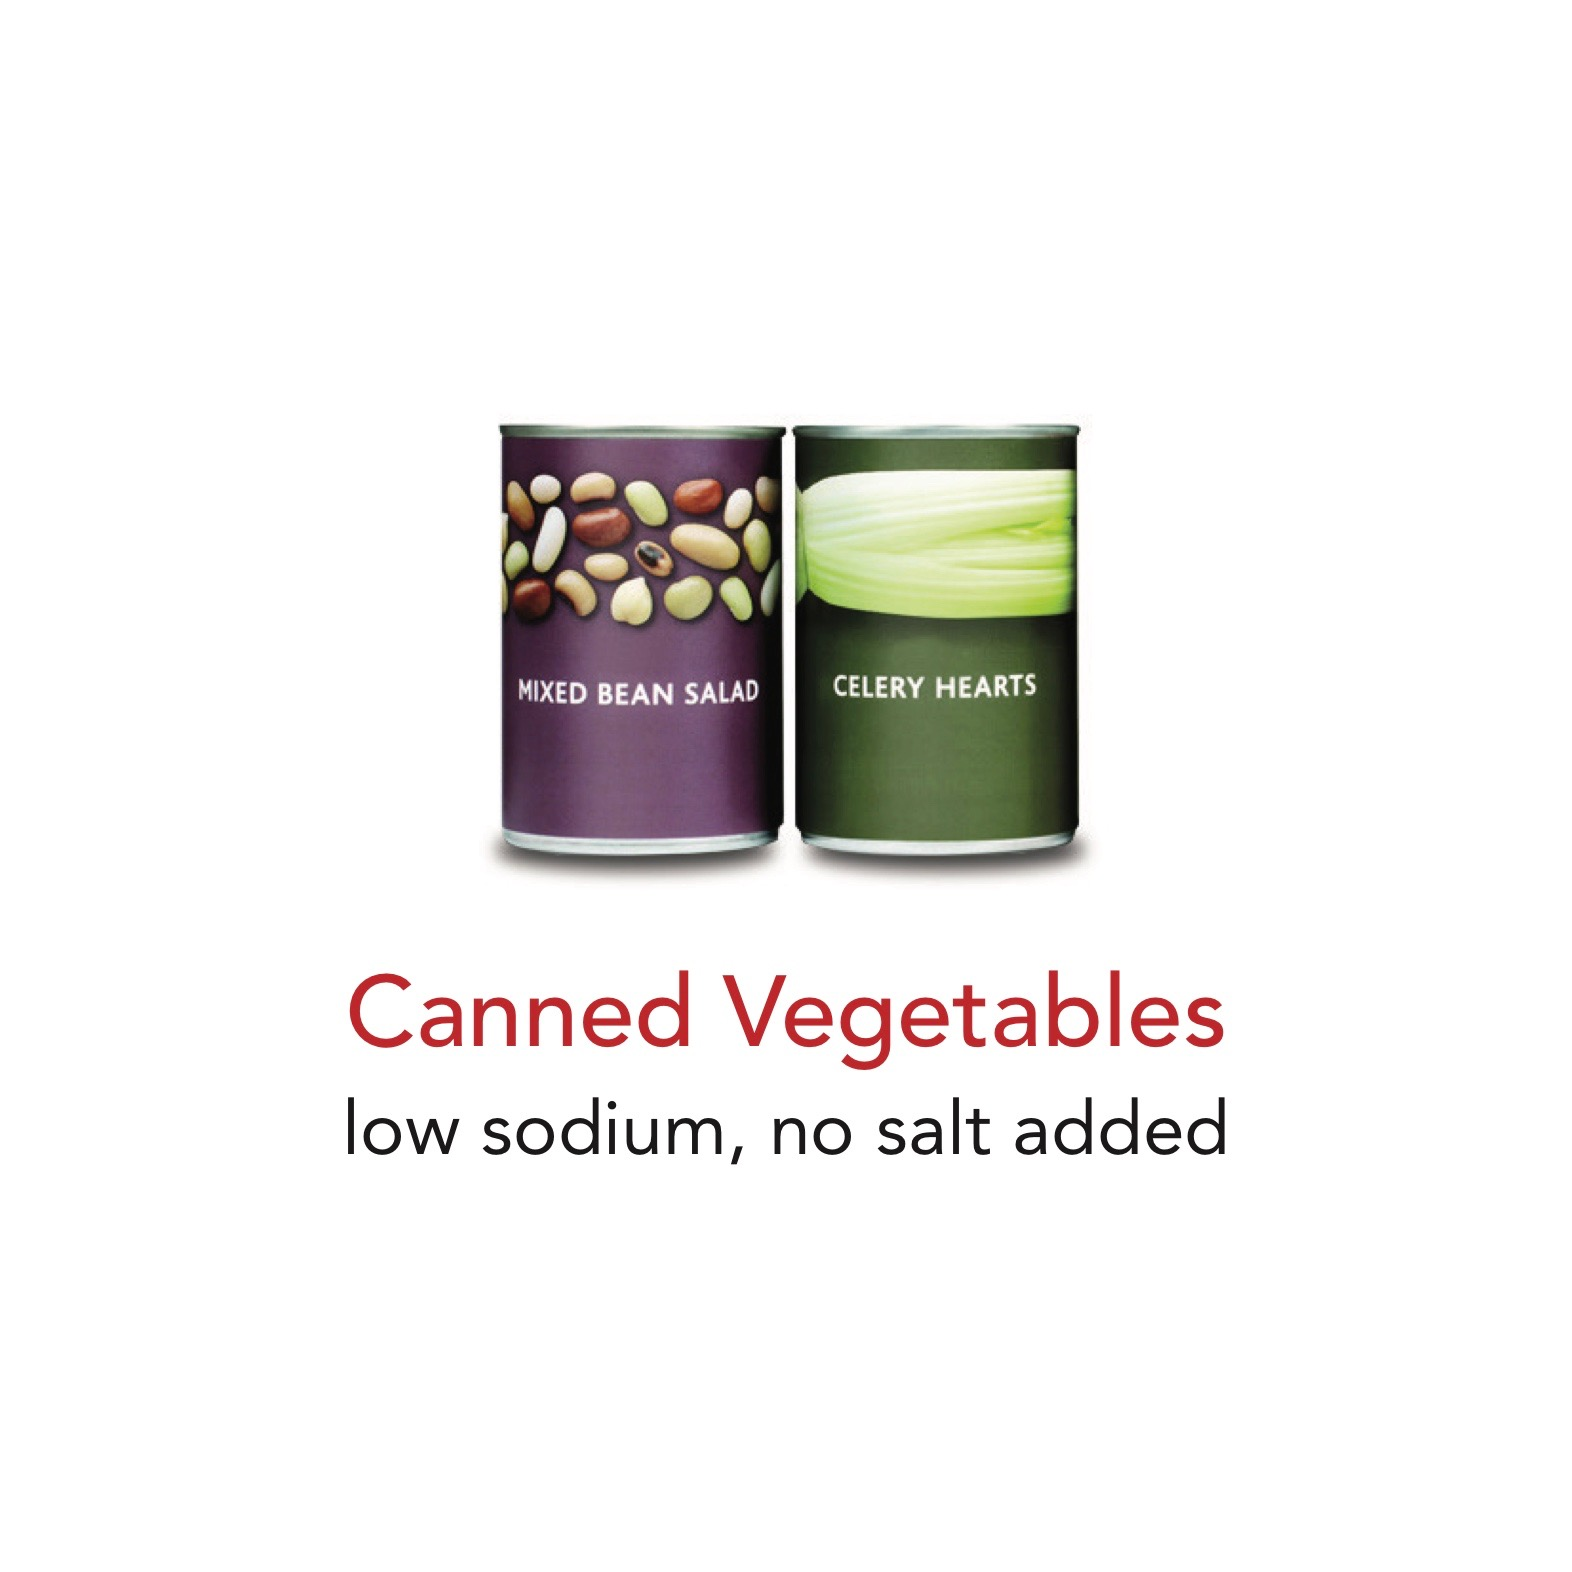 CannedVegetables.jpeg